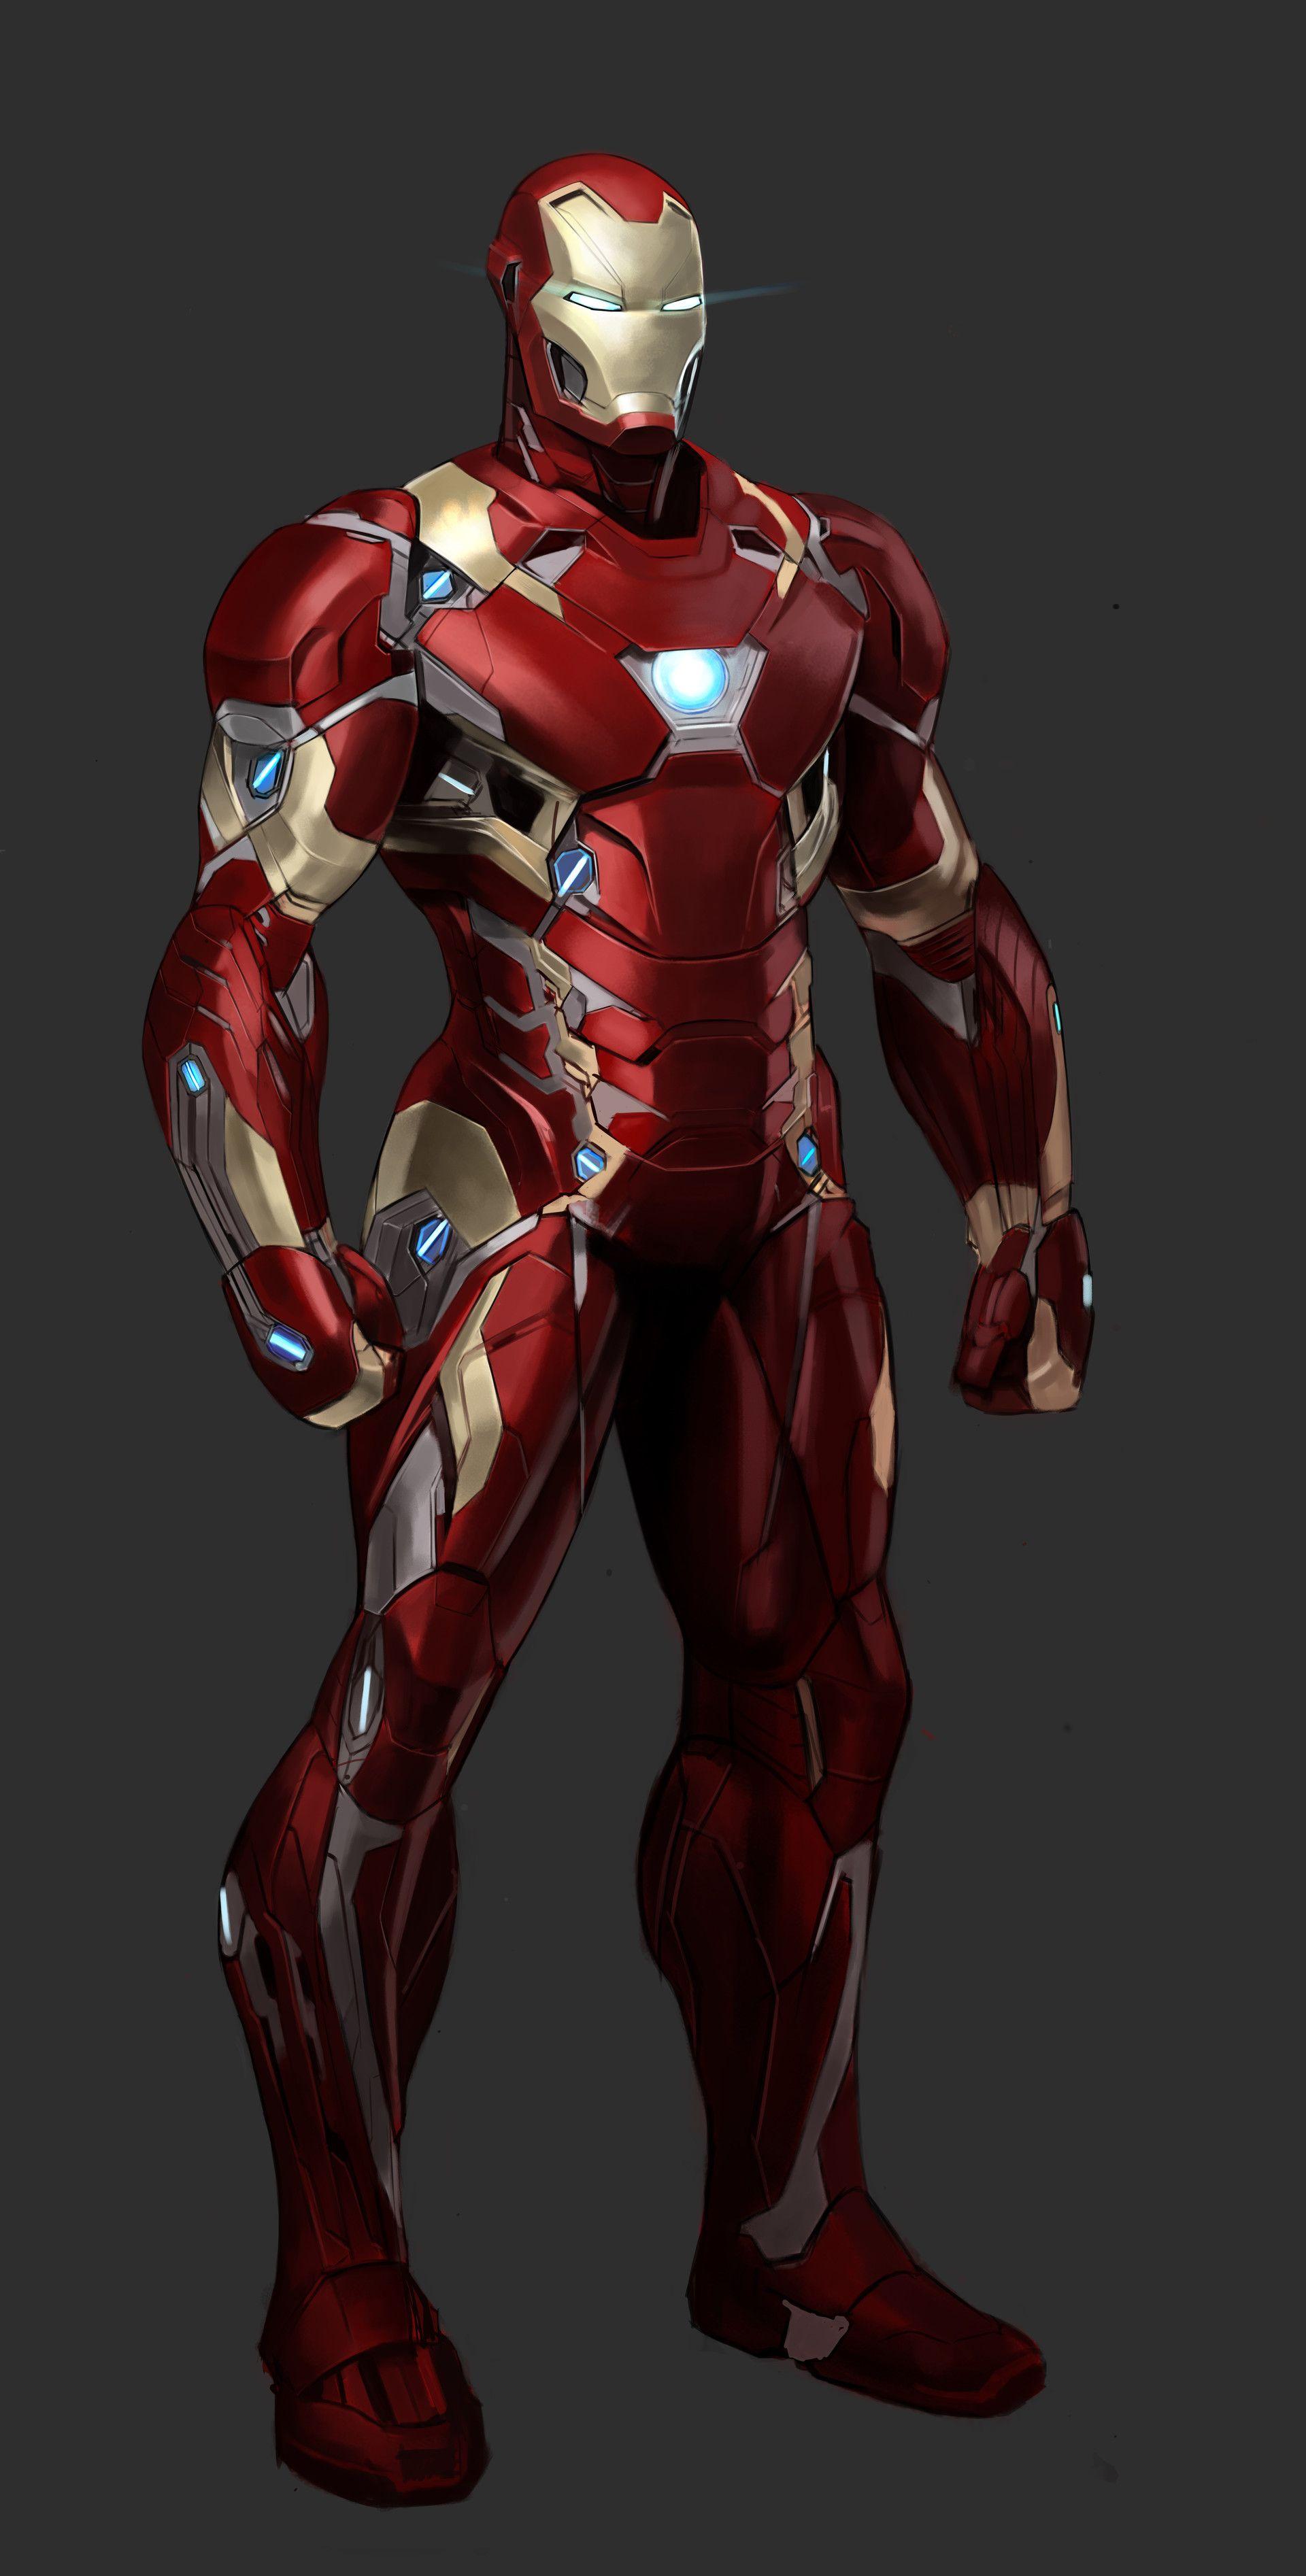 Avengers Endgame Iron Man Mark Lxxxv Life Size Figure From Hot Toys Iron Man Artwork Iron Man Fan Art Iron Man Avengers